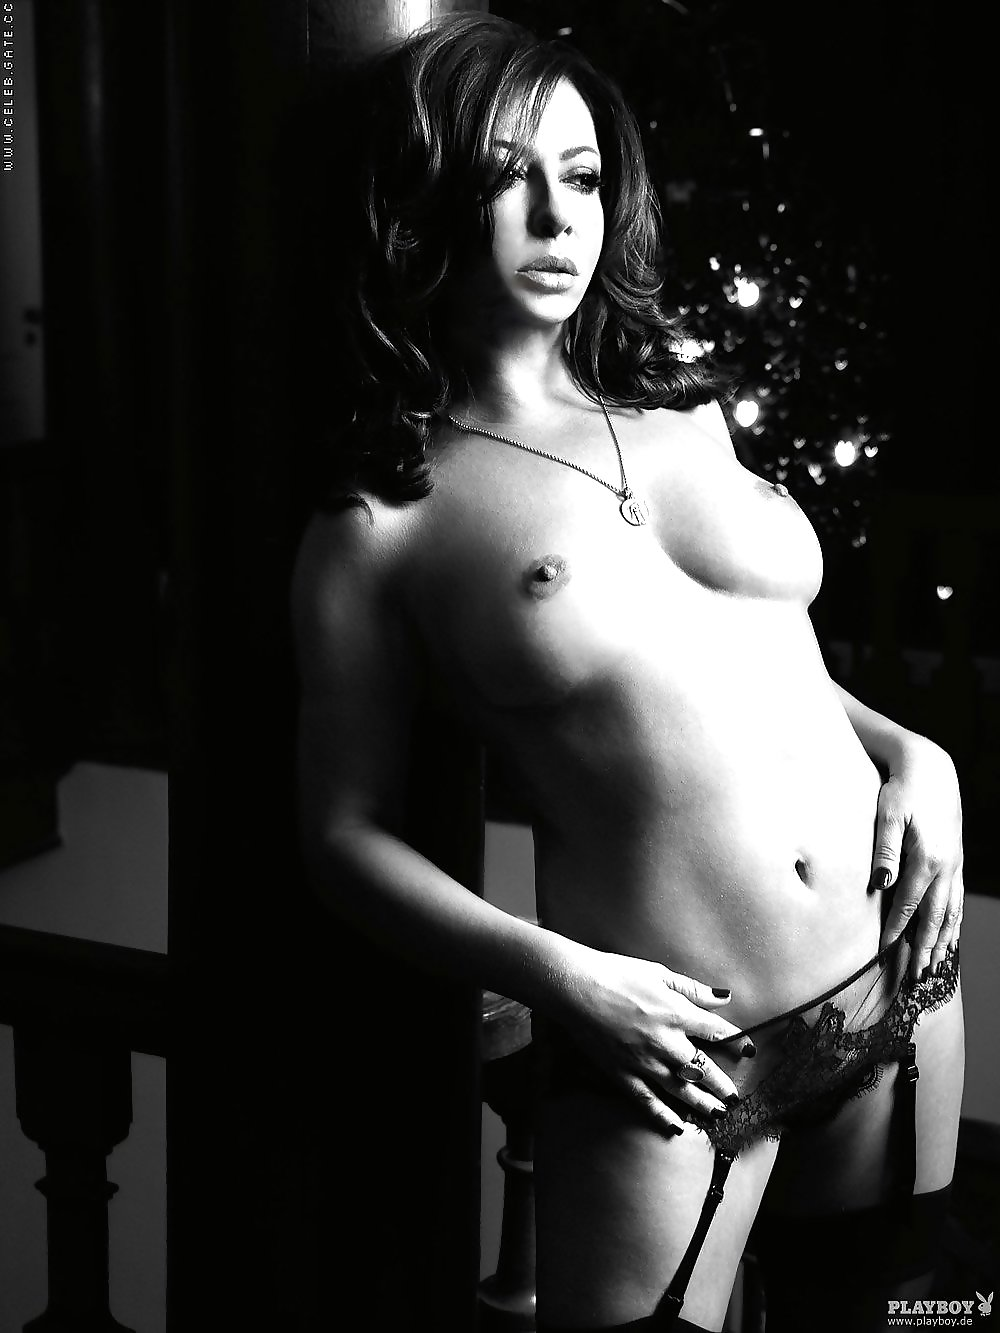 Thomalla playboy bilder nackt sophia Ach du